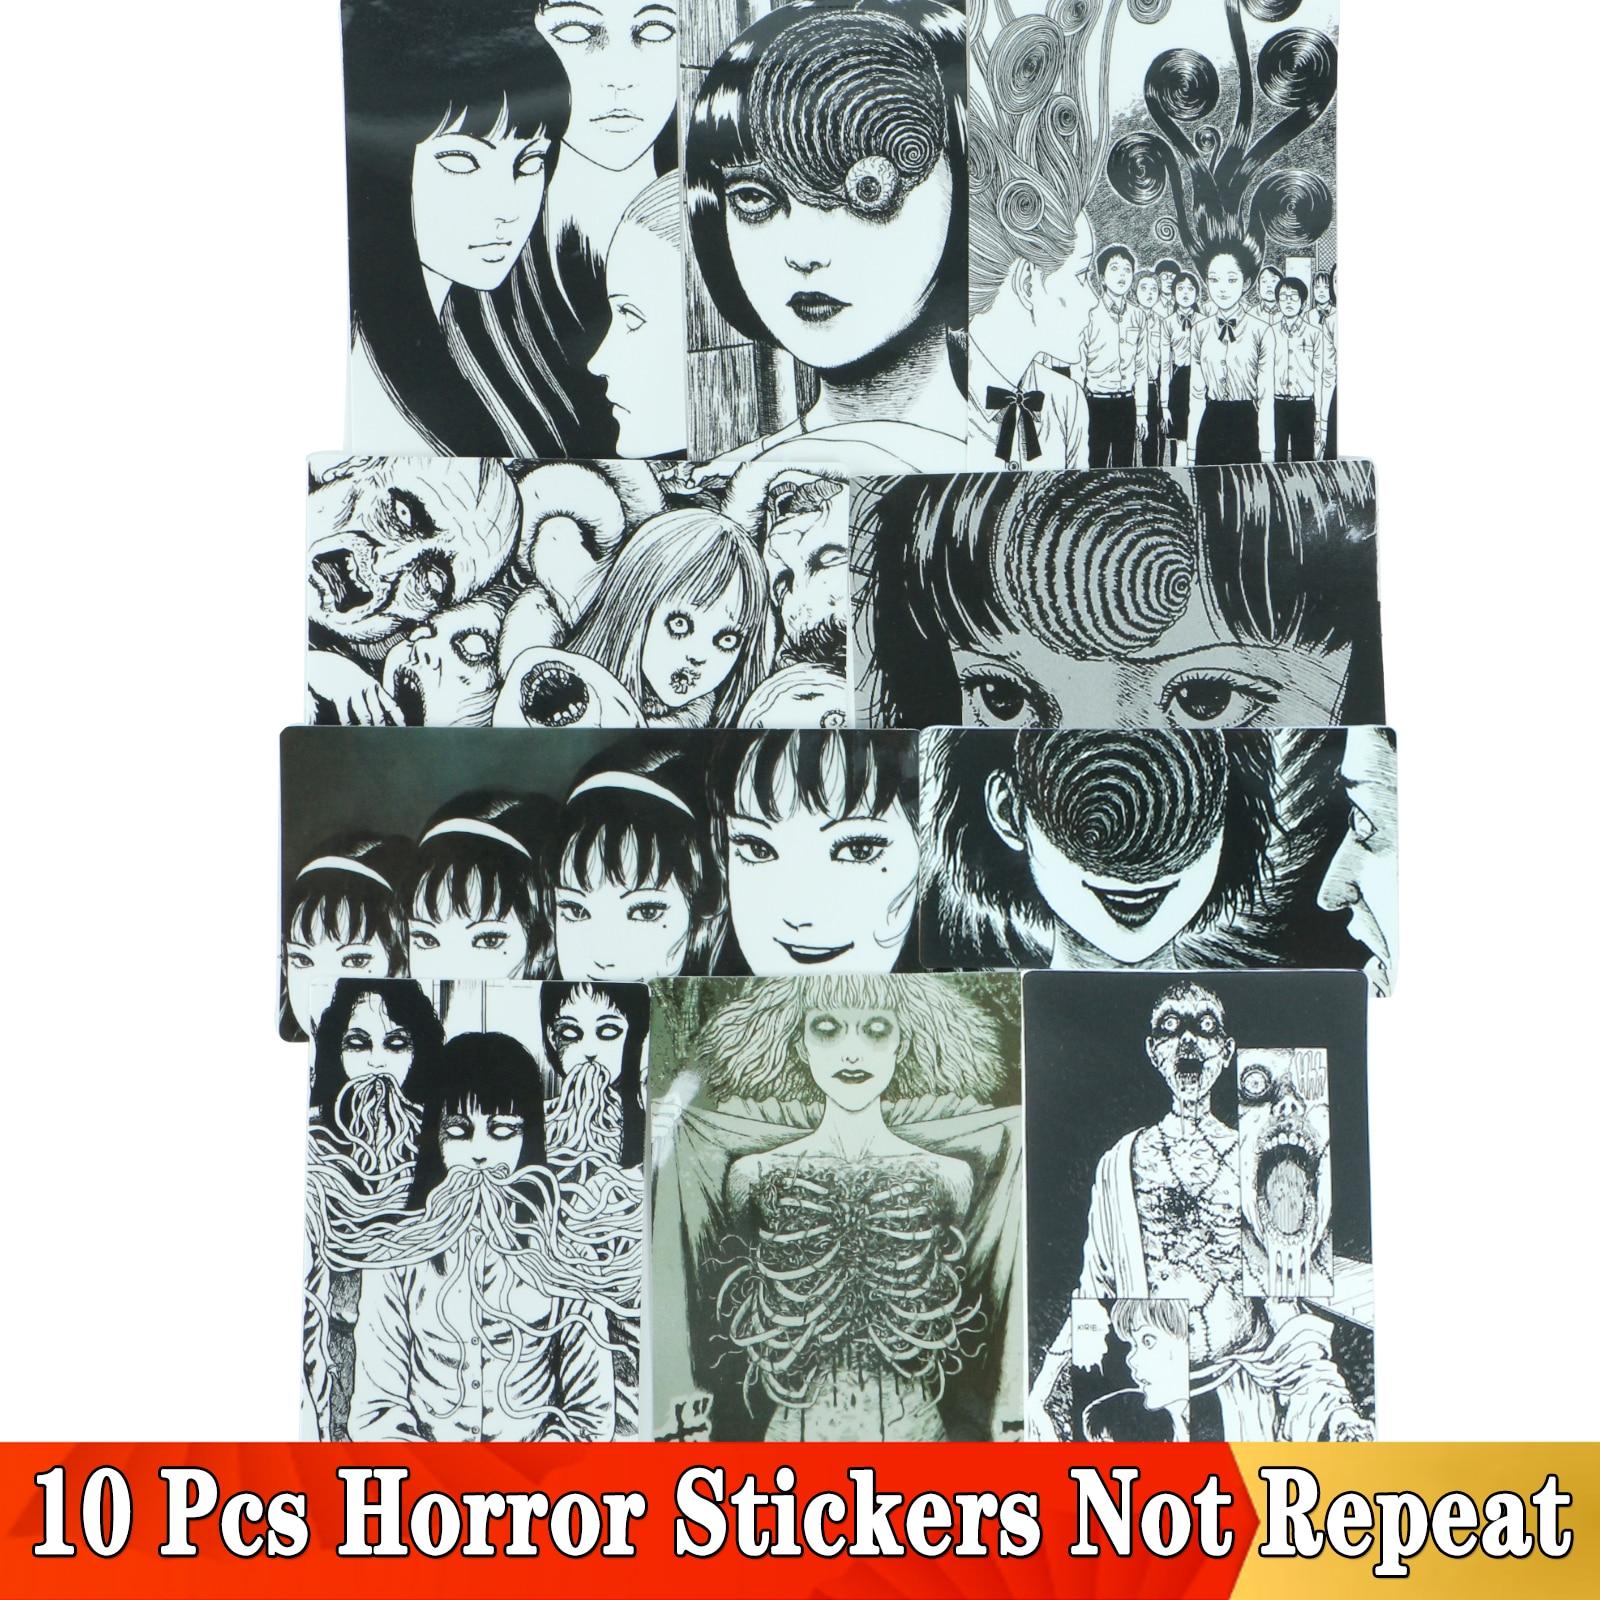 10 Pcs Horror Comic Sticker Junji Ito Fujiang Tomie Black and White Japan Anime for Snowboard Laptop Luggage Car Fridge Stickers(China)